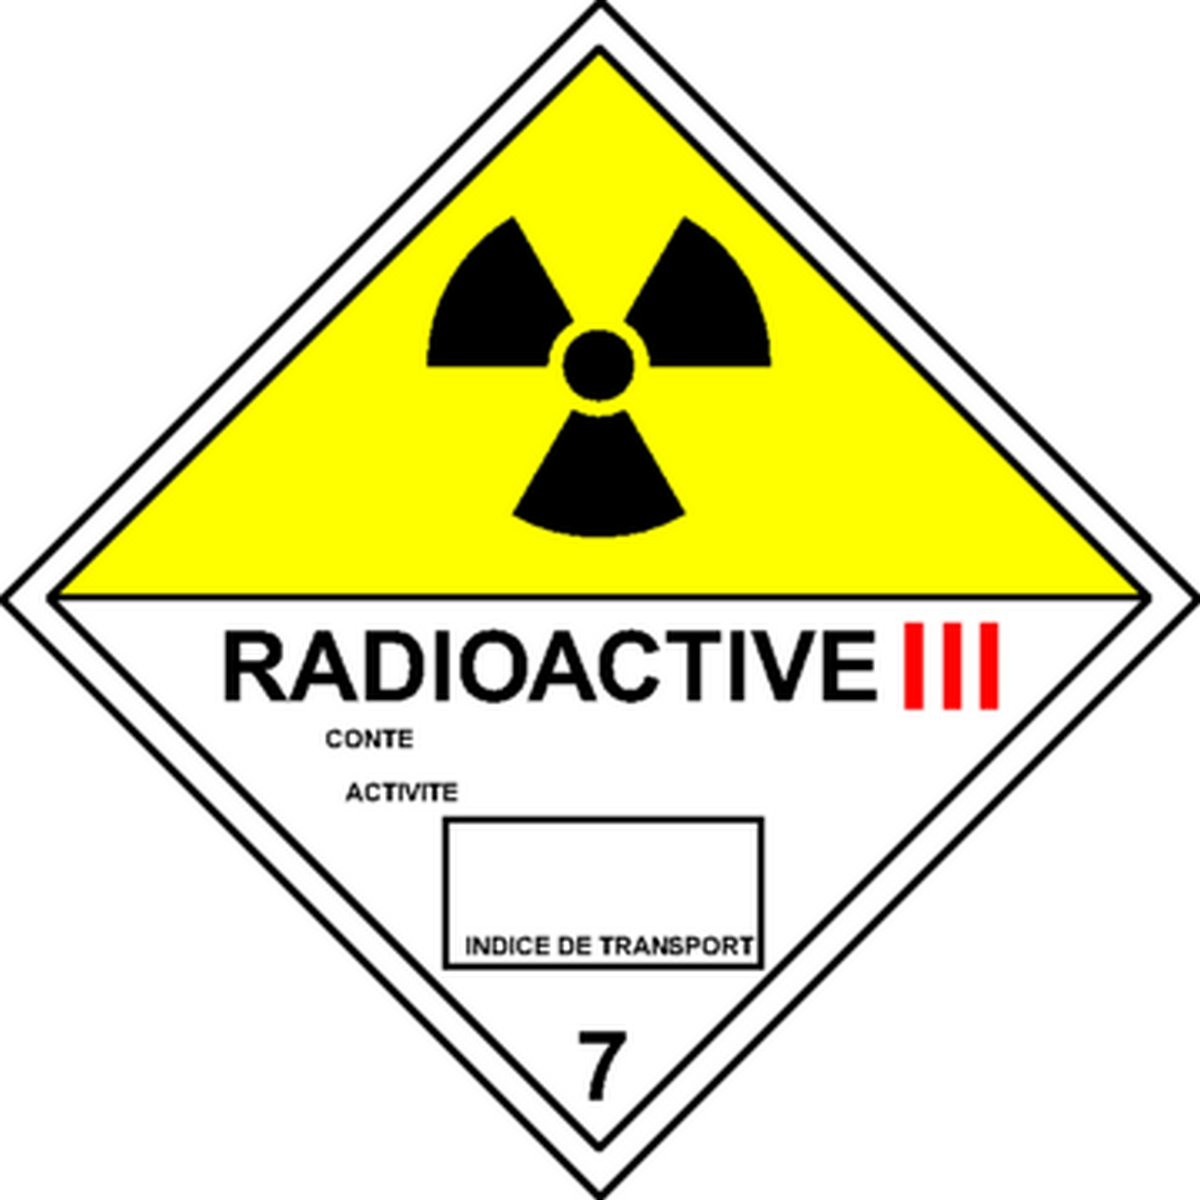 Etiquette Radioactive III en anglais